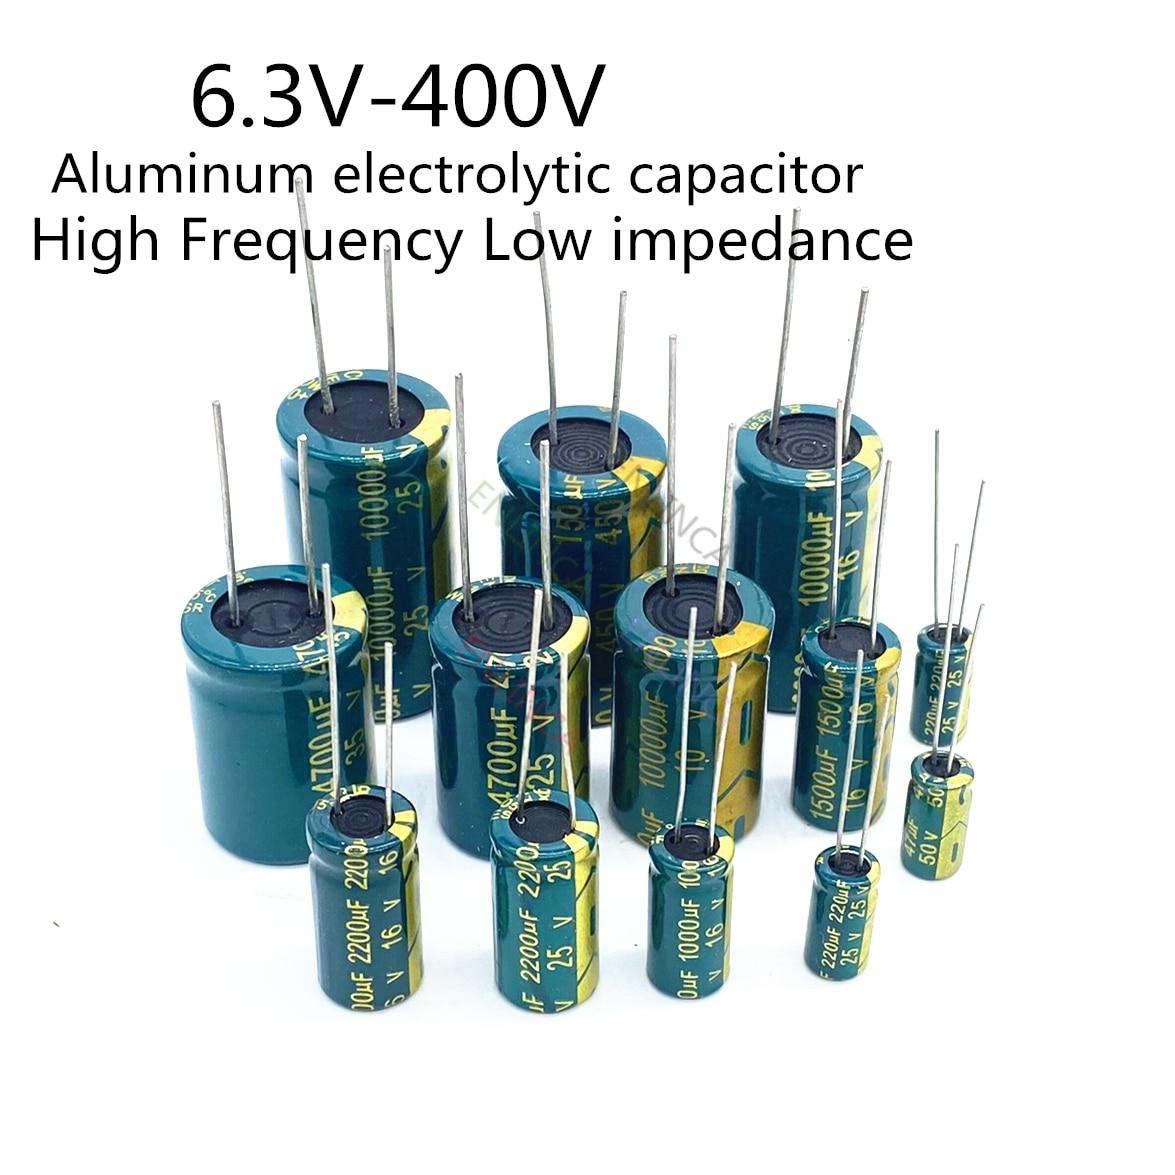 High Frequency Electrolytic Capacitor 6.3V 10V 16V 25V 35V 50V 400V 450V 22UF 100UF 220UF 330UF 470UF 680UF 1000UF 1500UF 2200UF